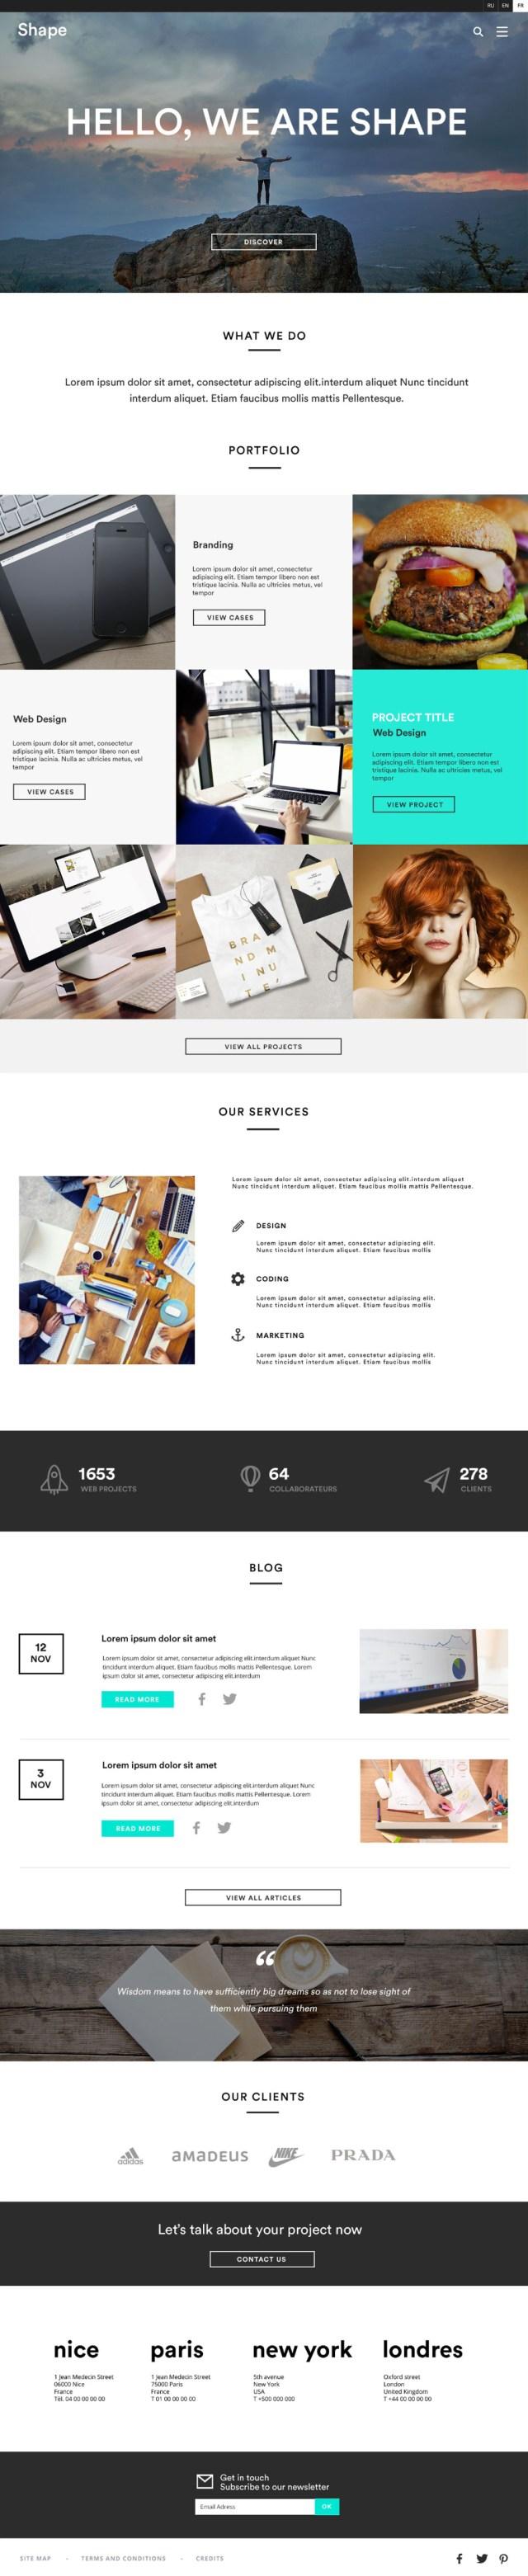 Shape Free Homepage UI Kit